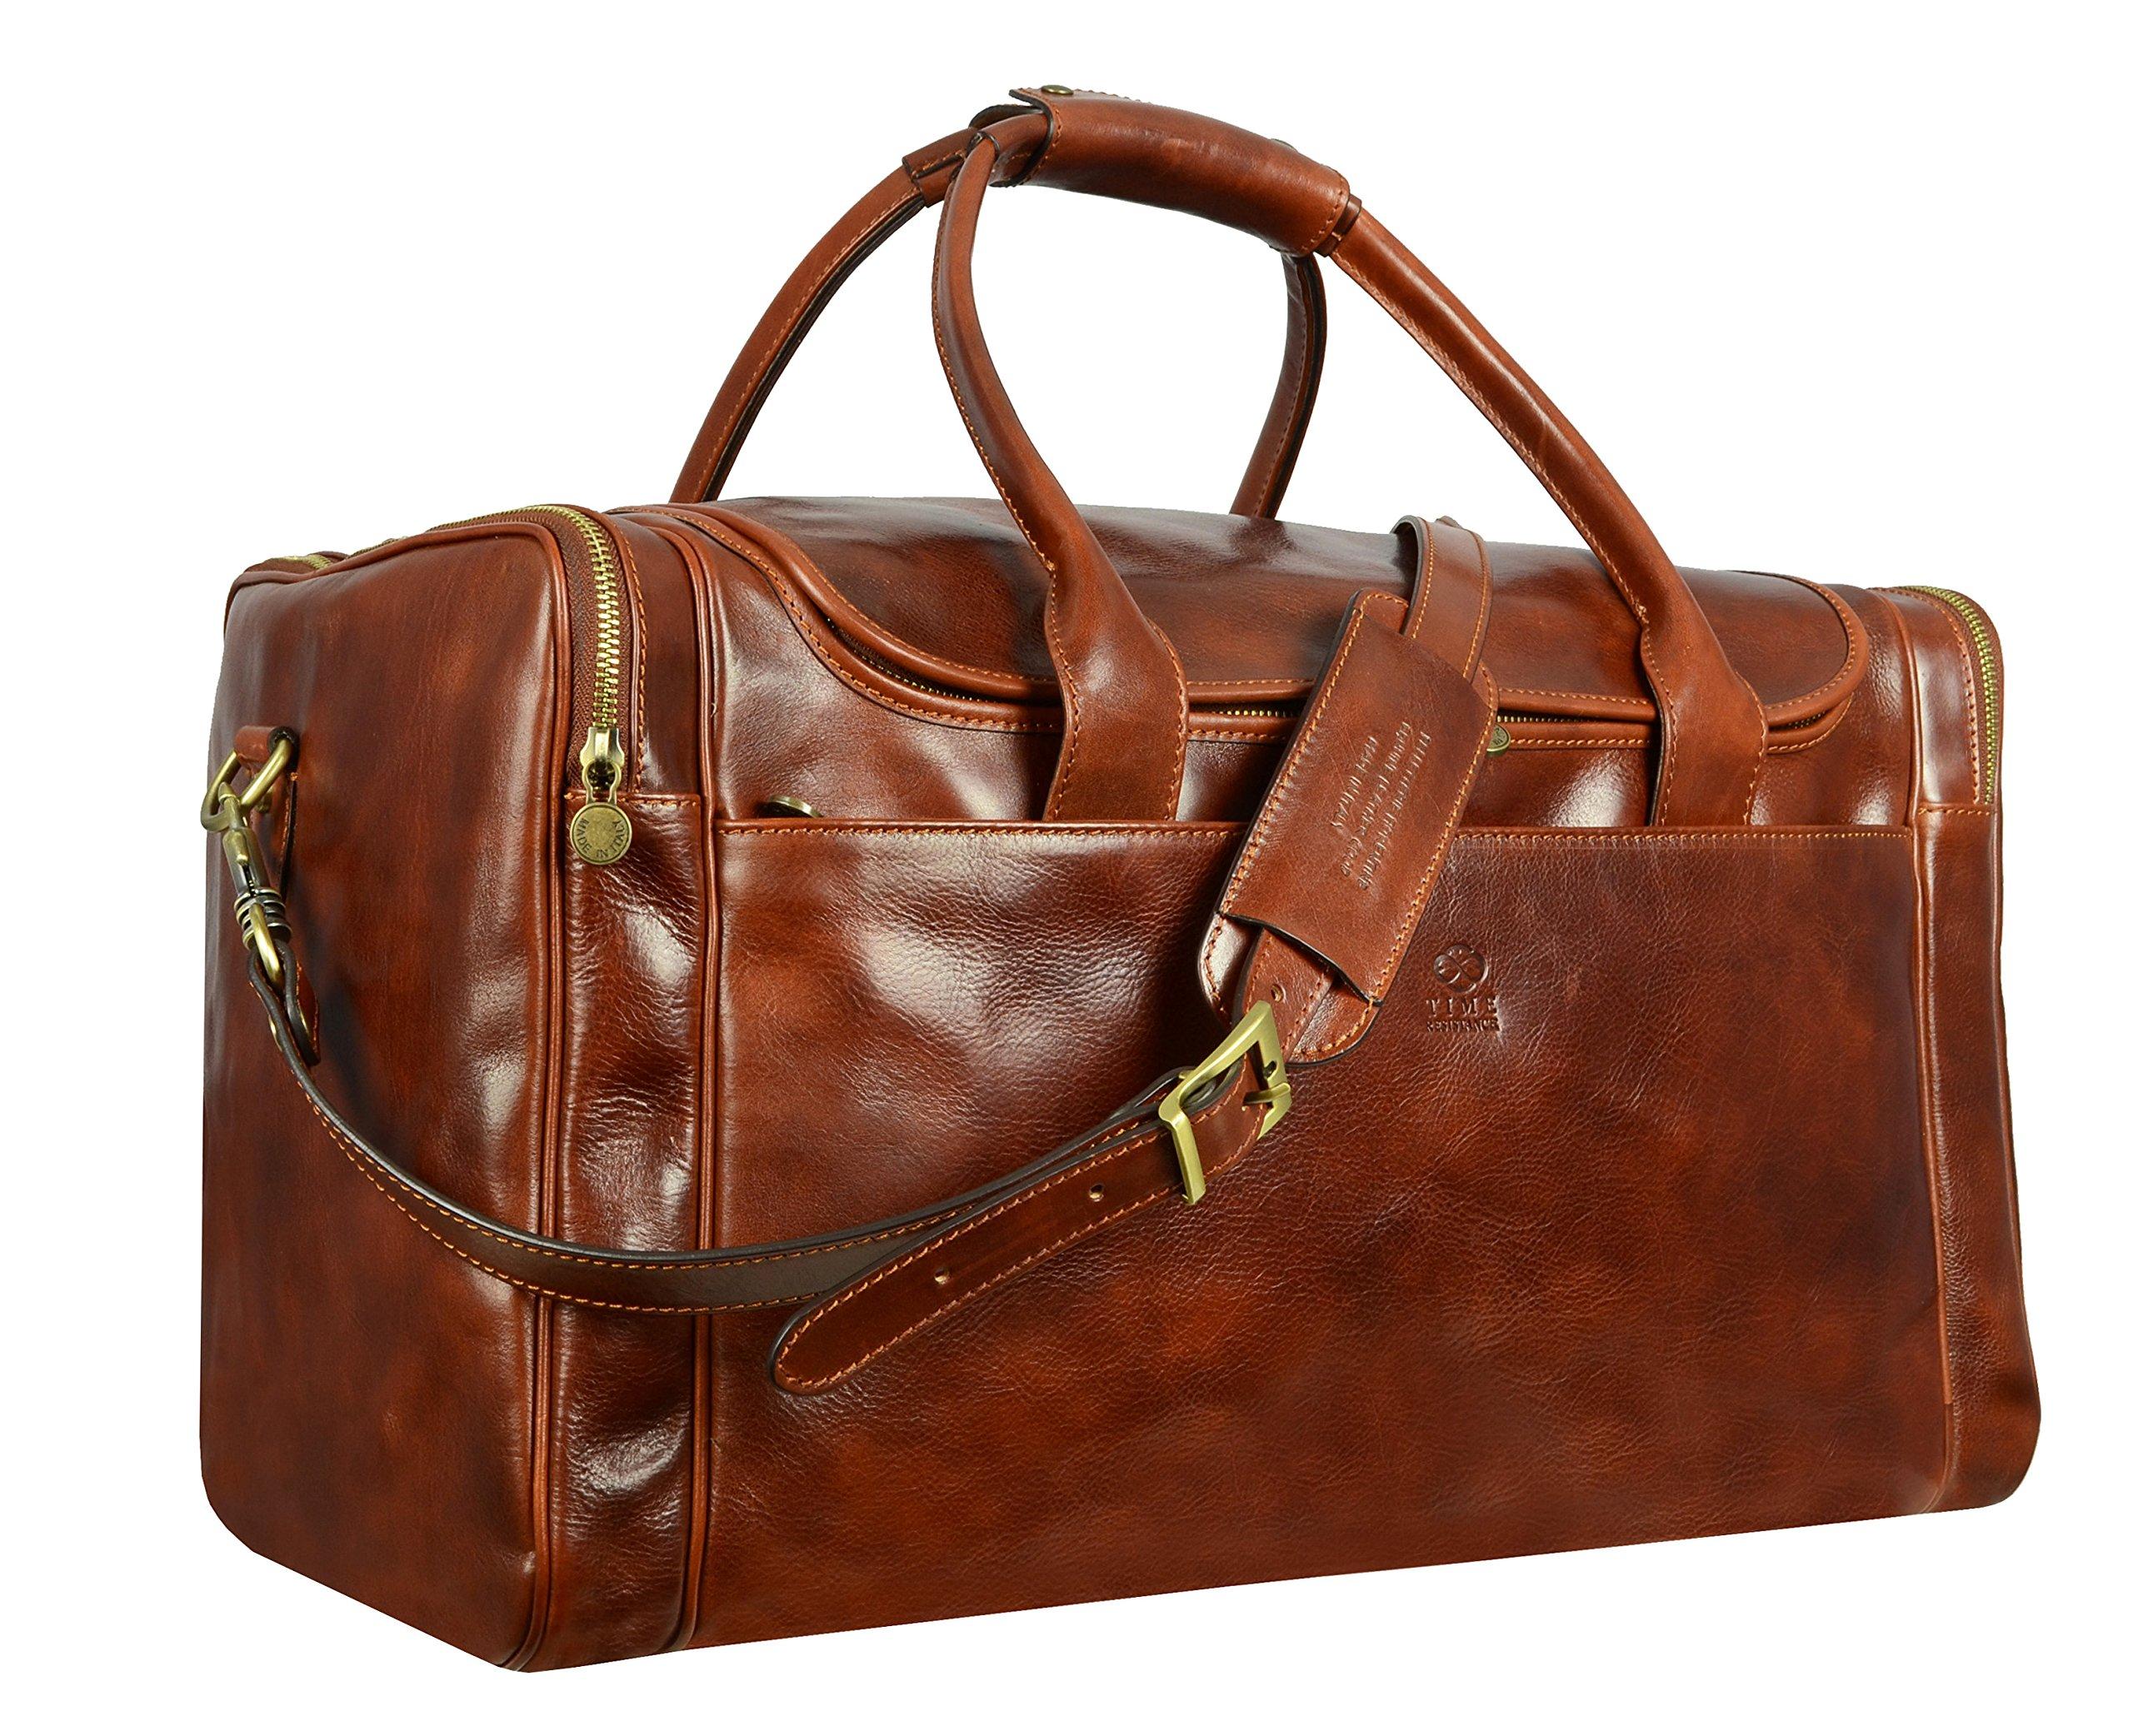 Leather Duffel Bag, Weekend Bag, Gym, Large Travel Bag, Cognac, Brown - Time Resistance by Time Resistance (Image #3)